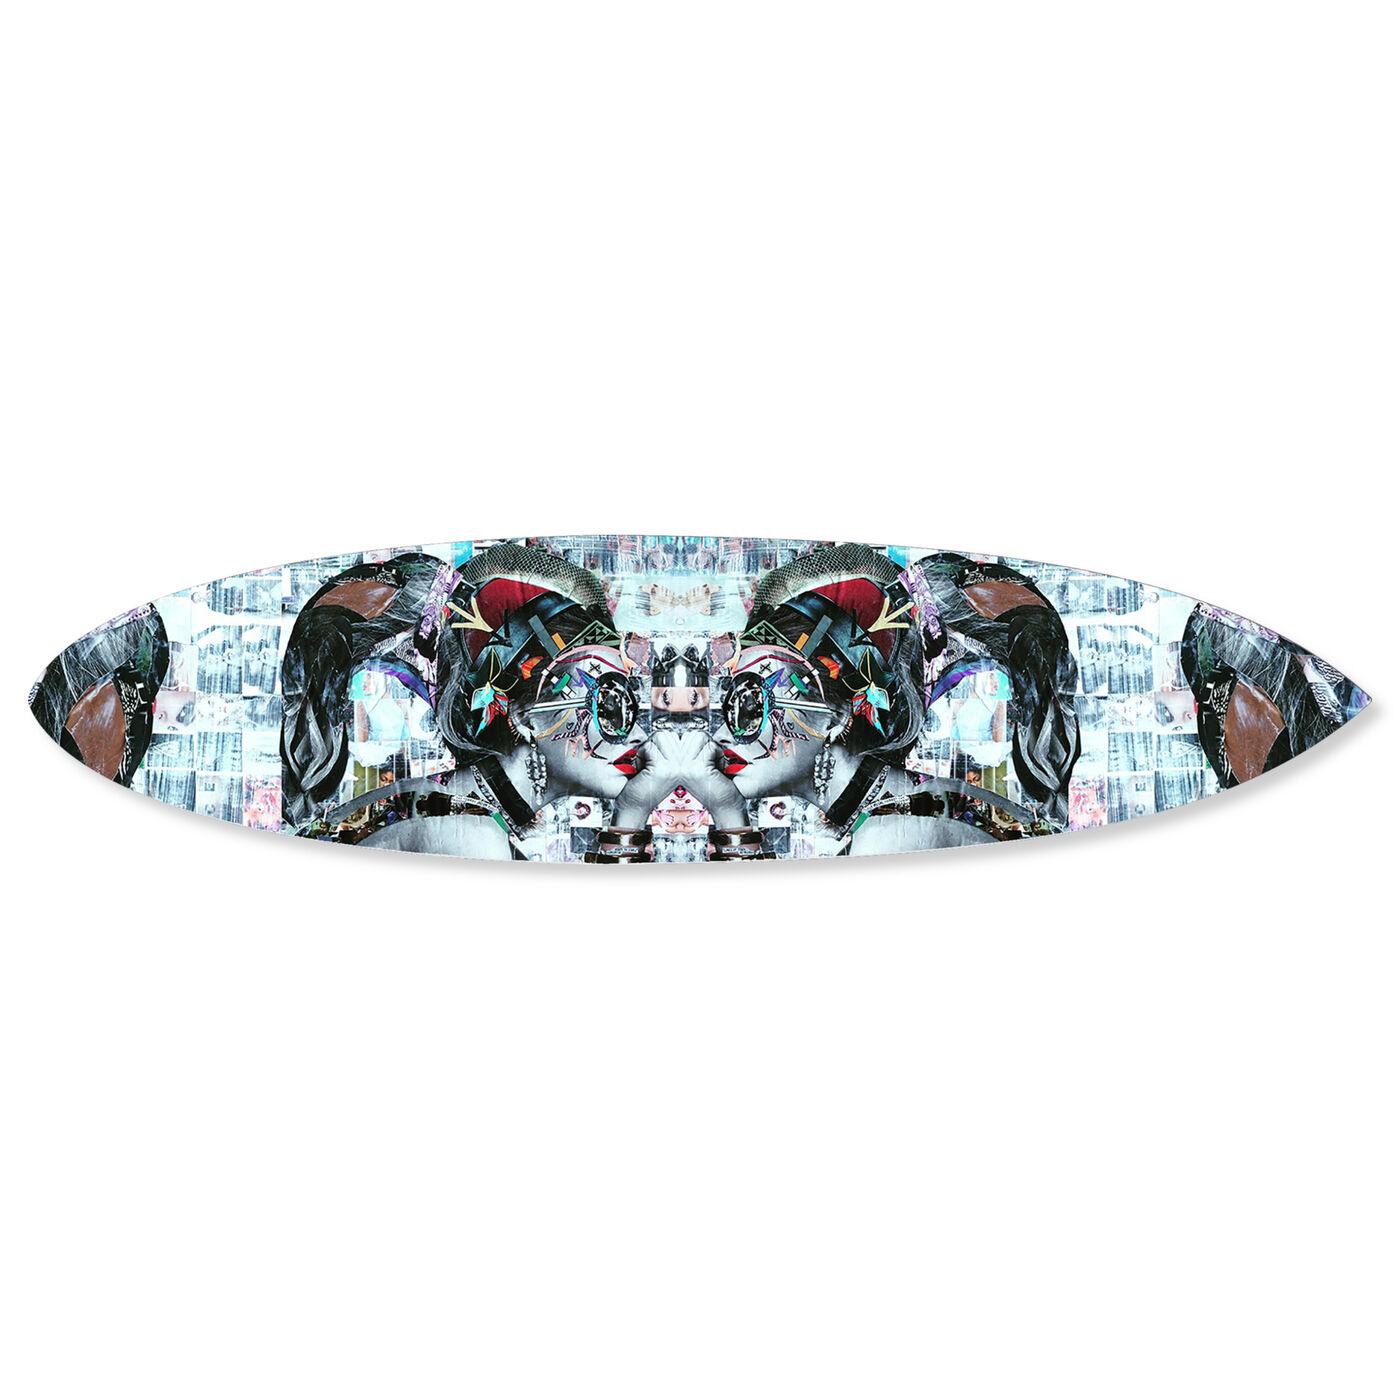 Katy Hirchsfeld - Aphrodite Surfboard